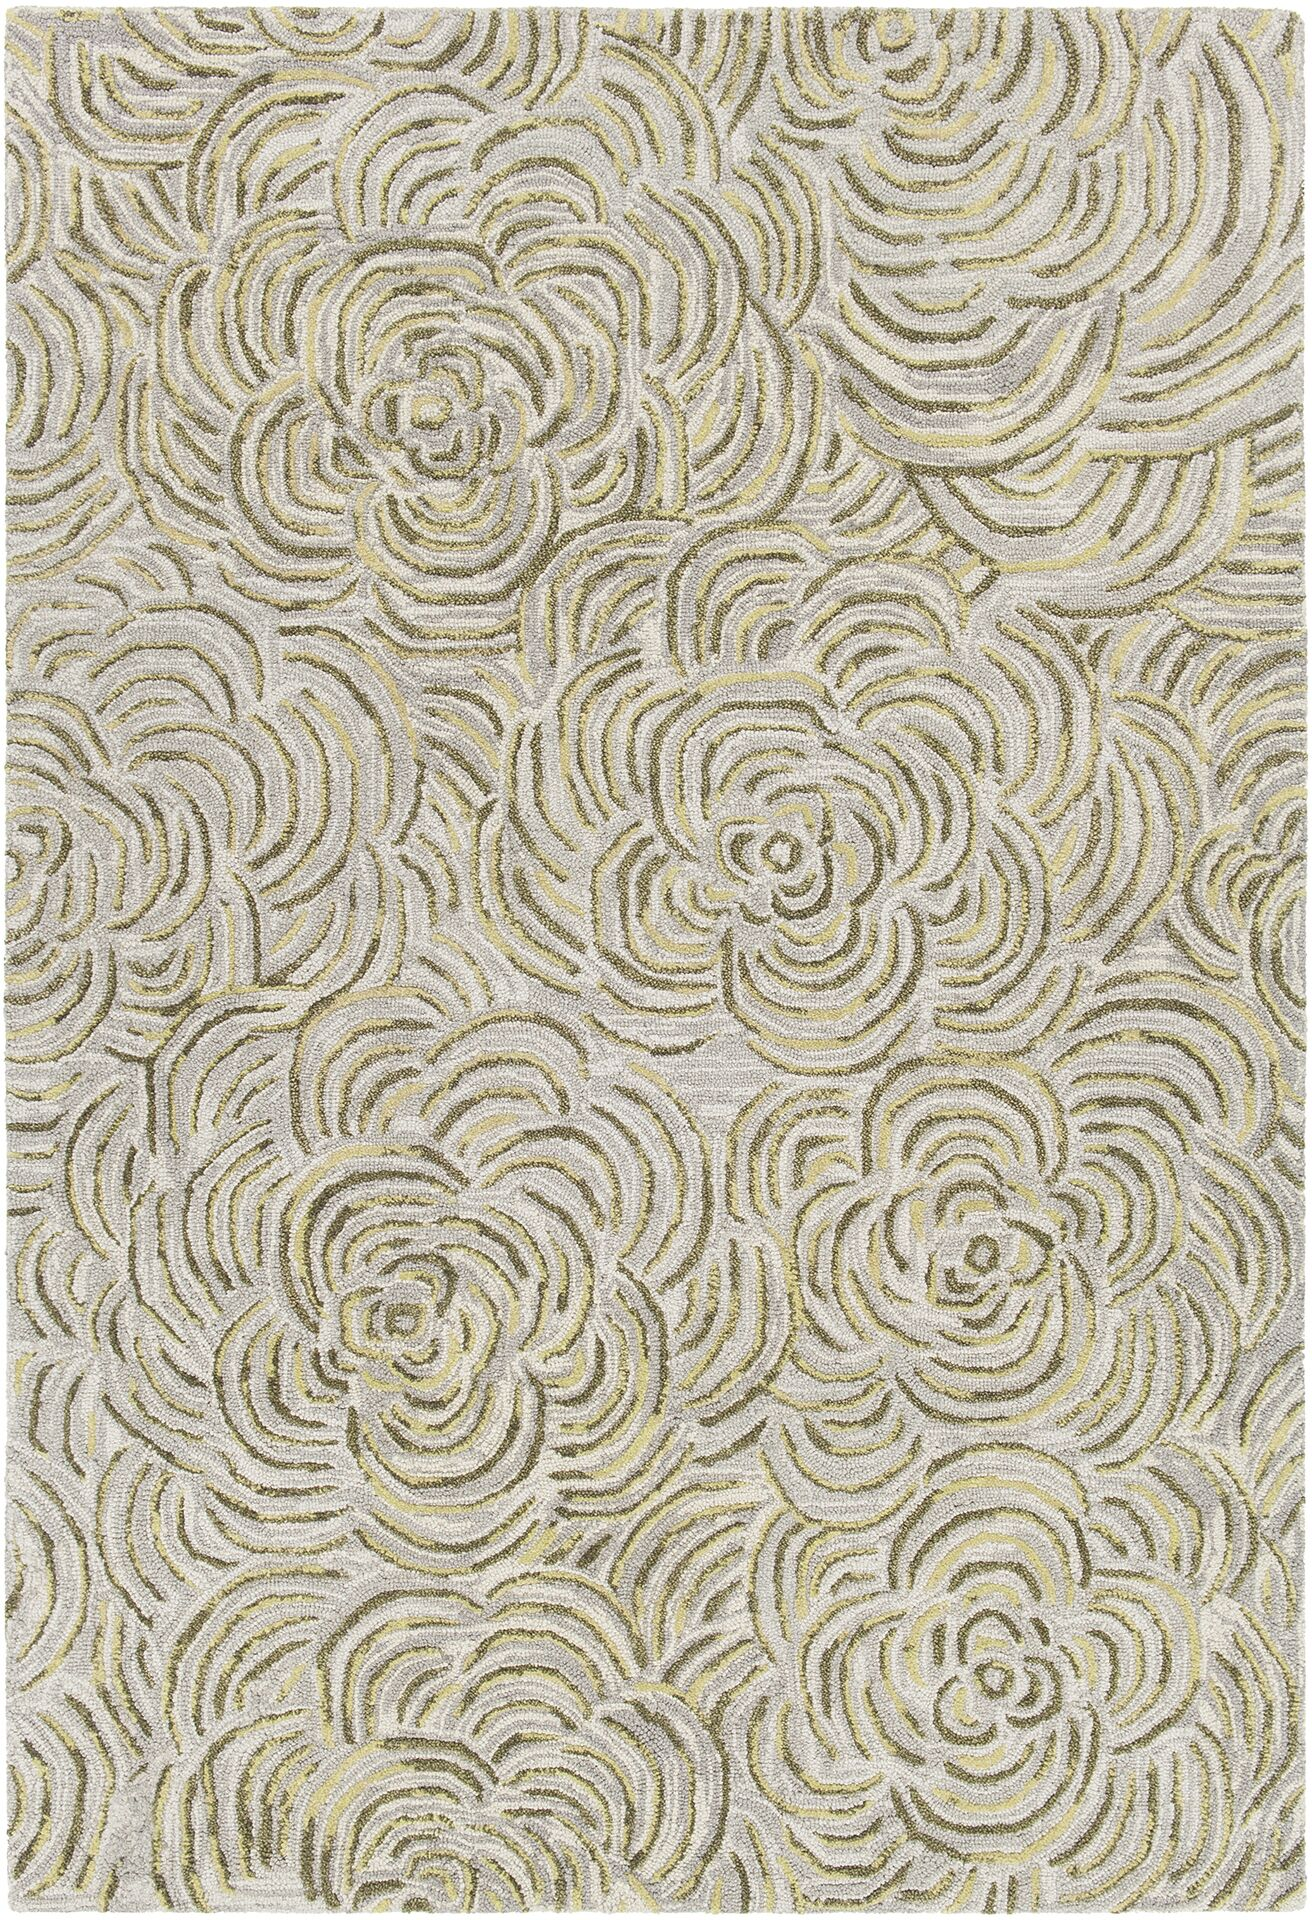 Wagstaff Hand-Tufted Green/Gray Area Rug Rug Size: 5' x 7'6